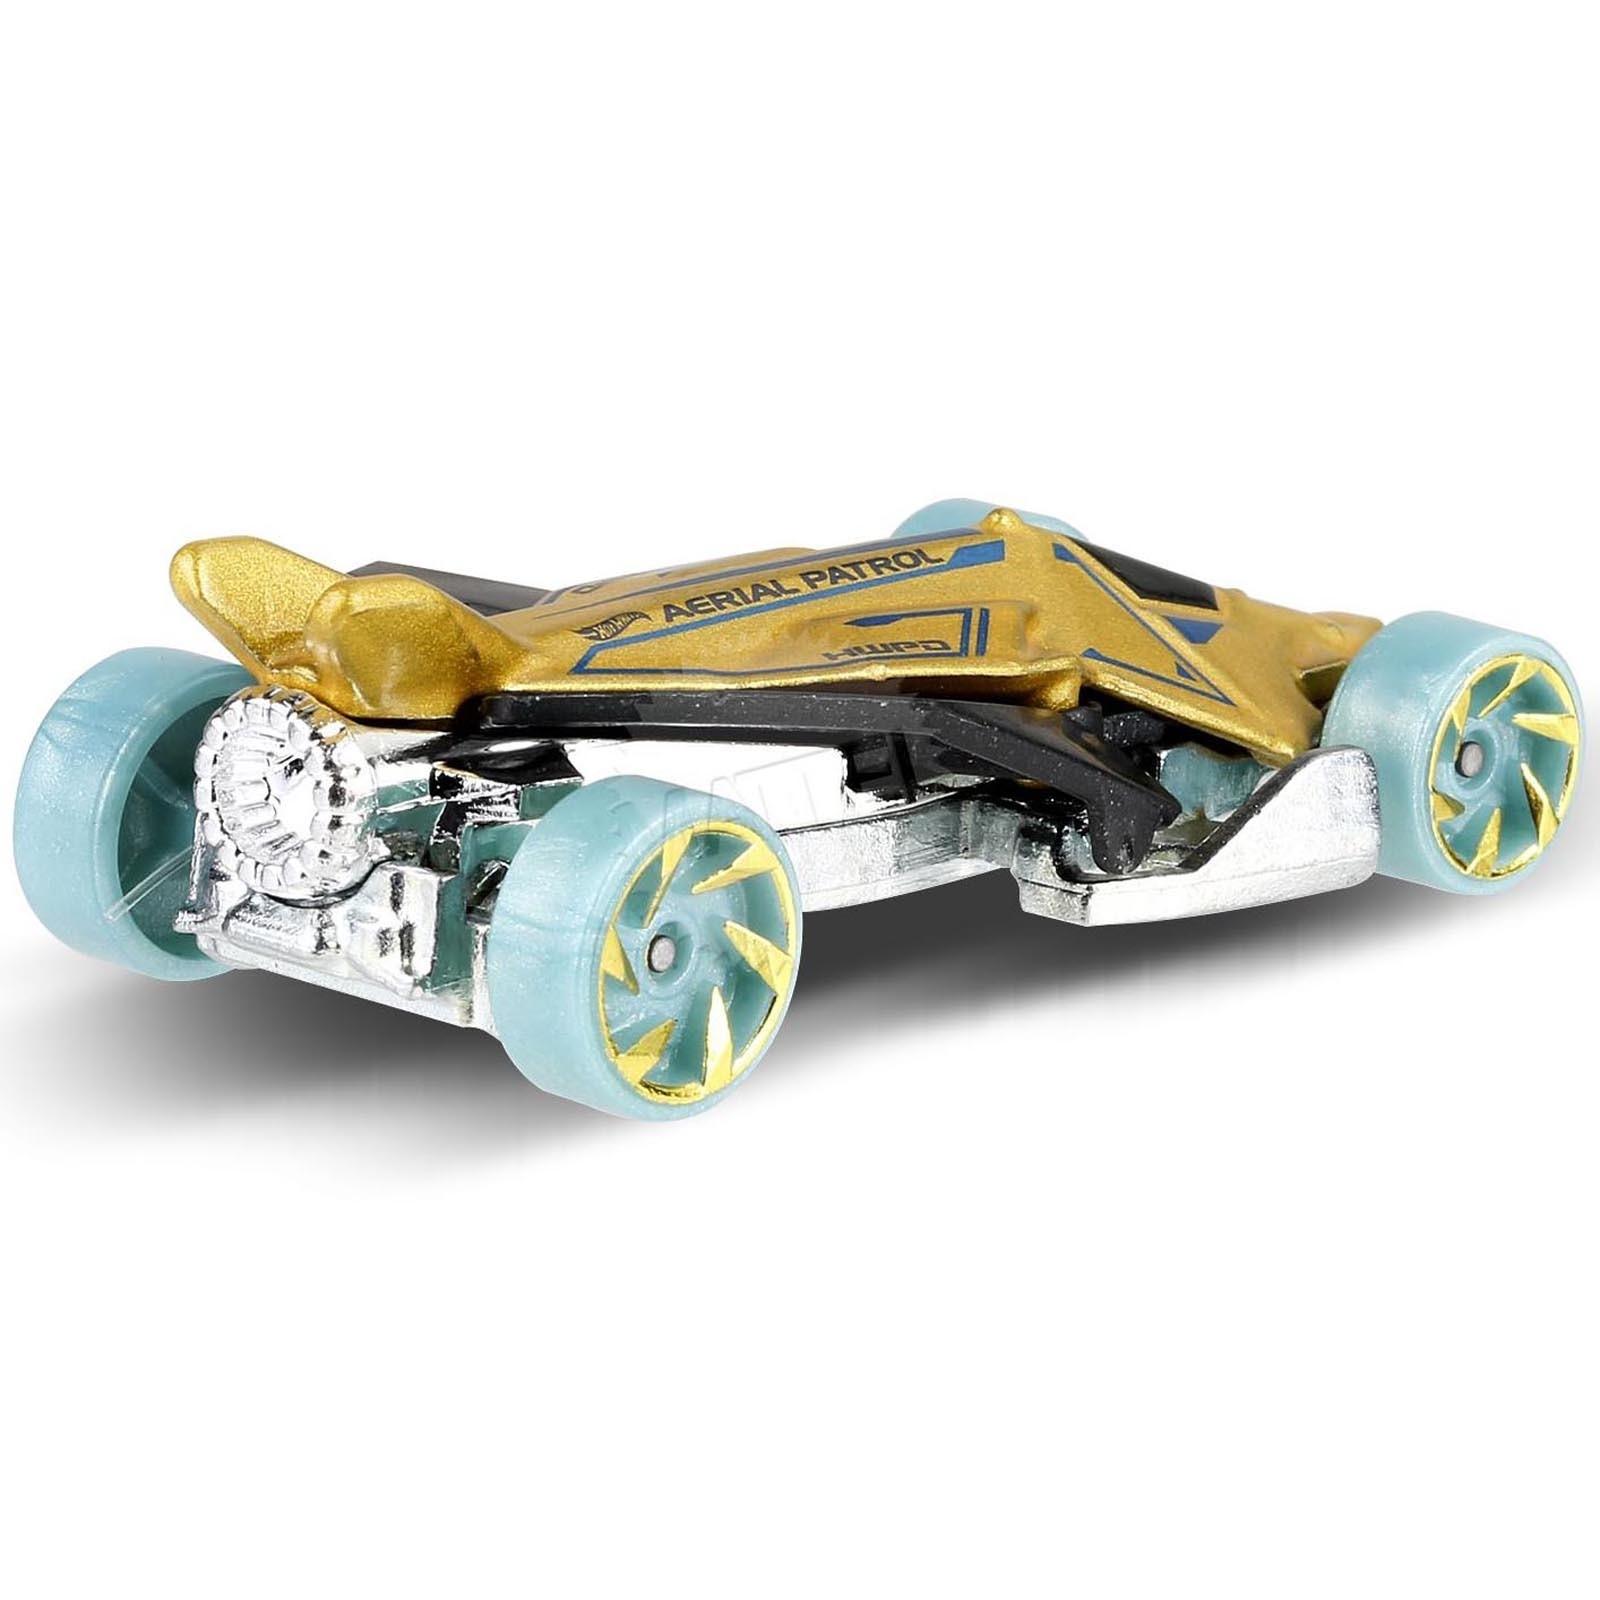 Hot Wheels - Airuption™ - FYG78